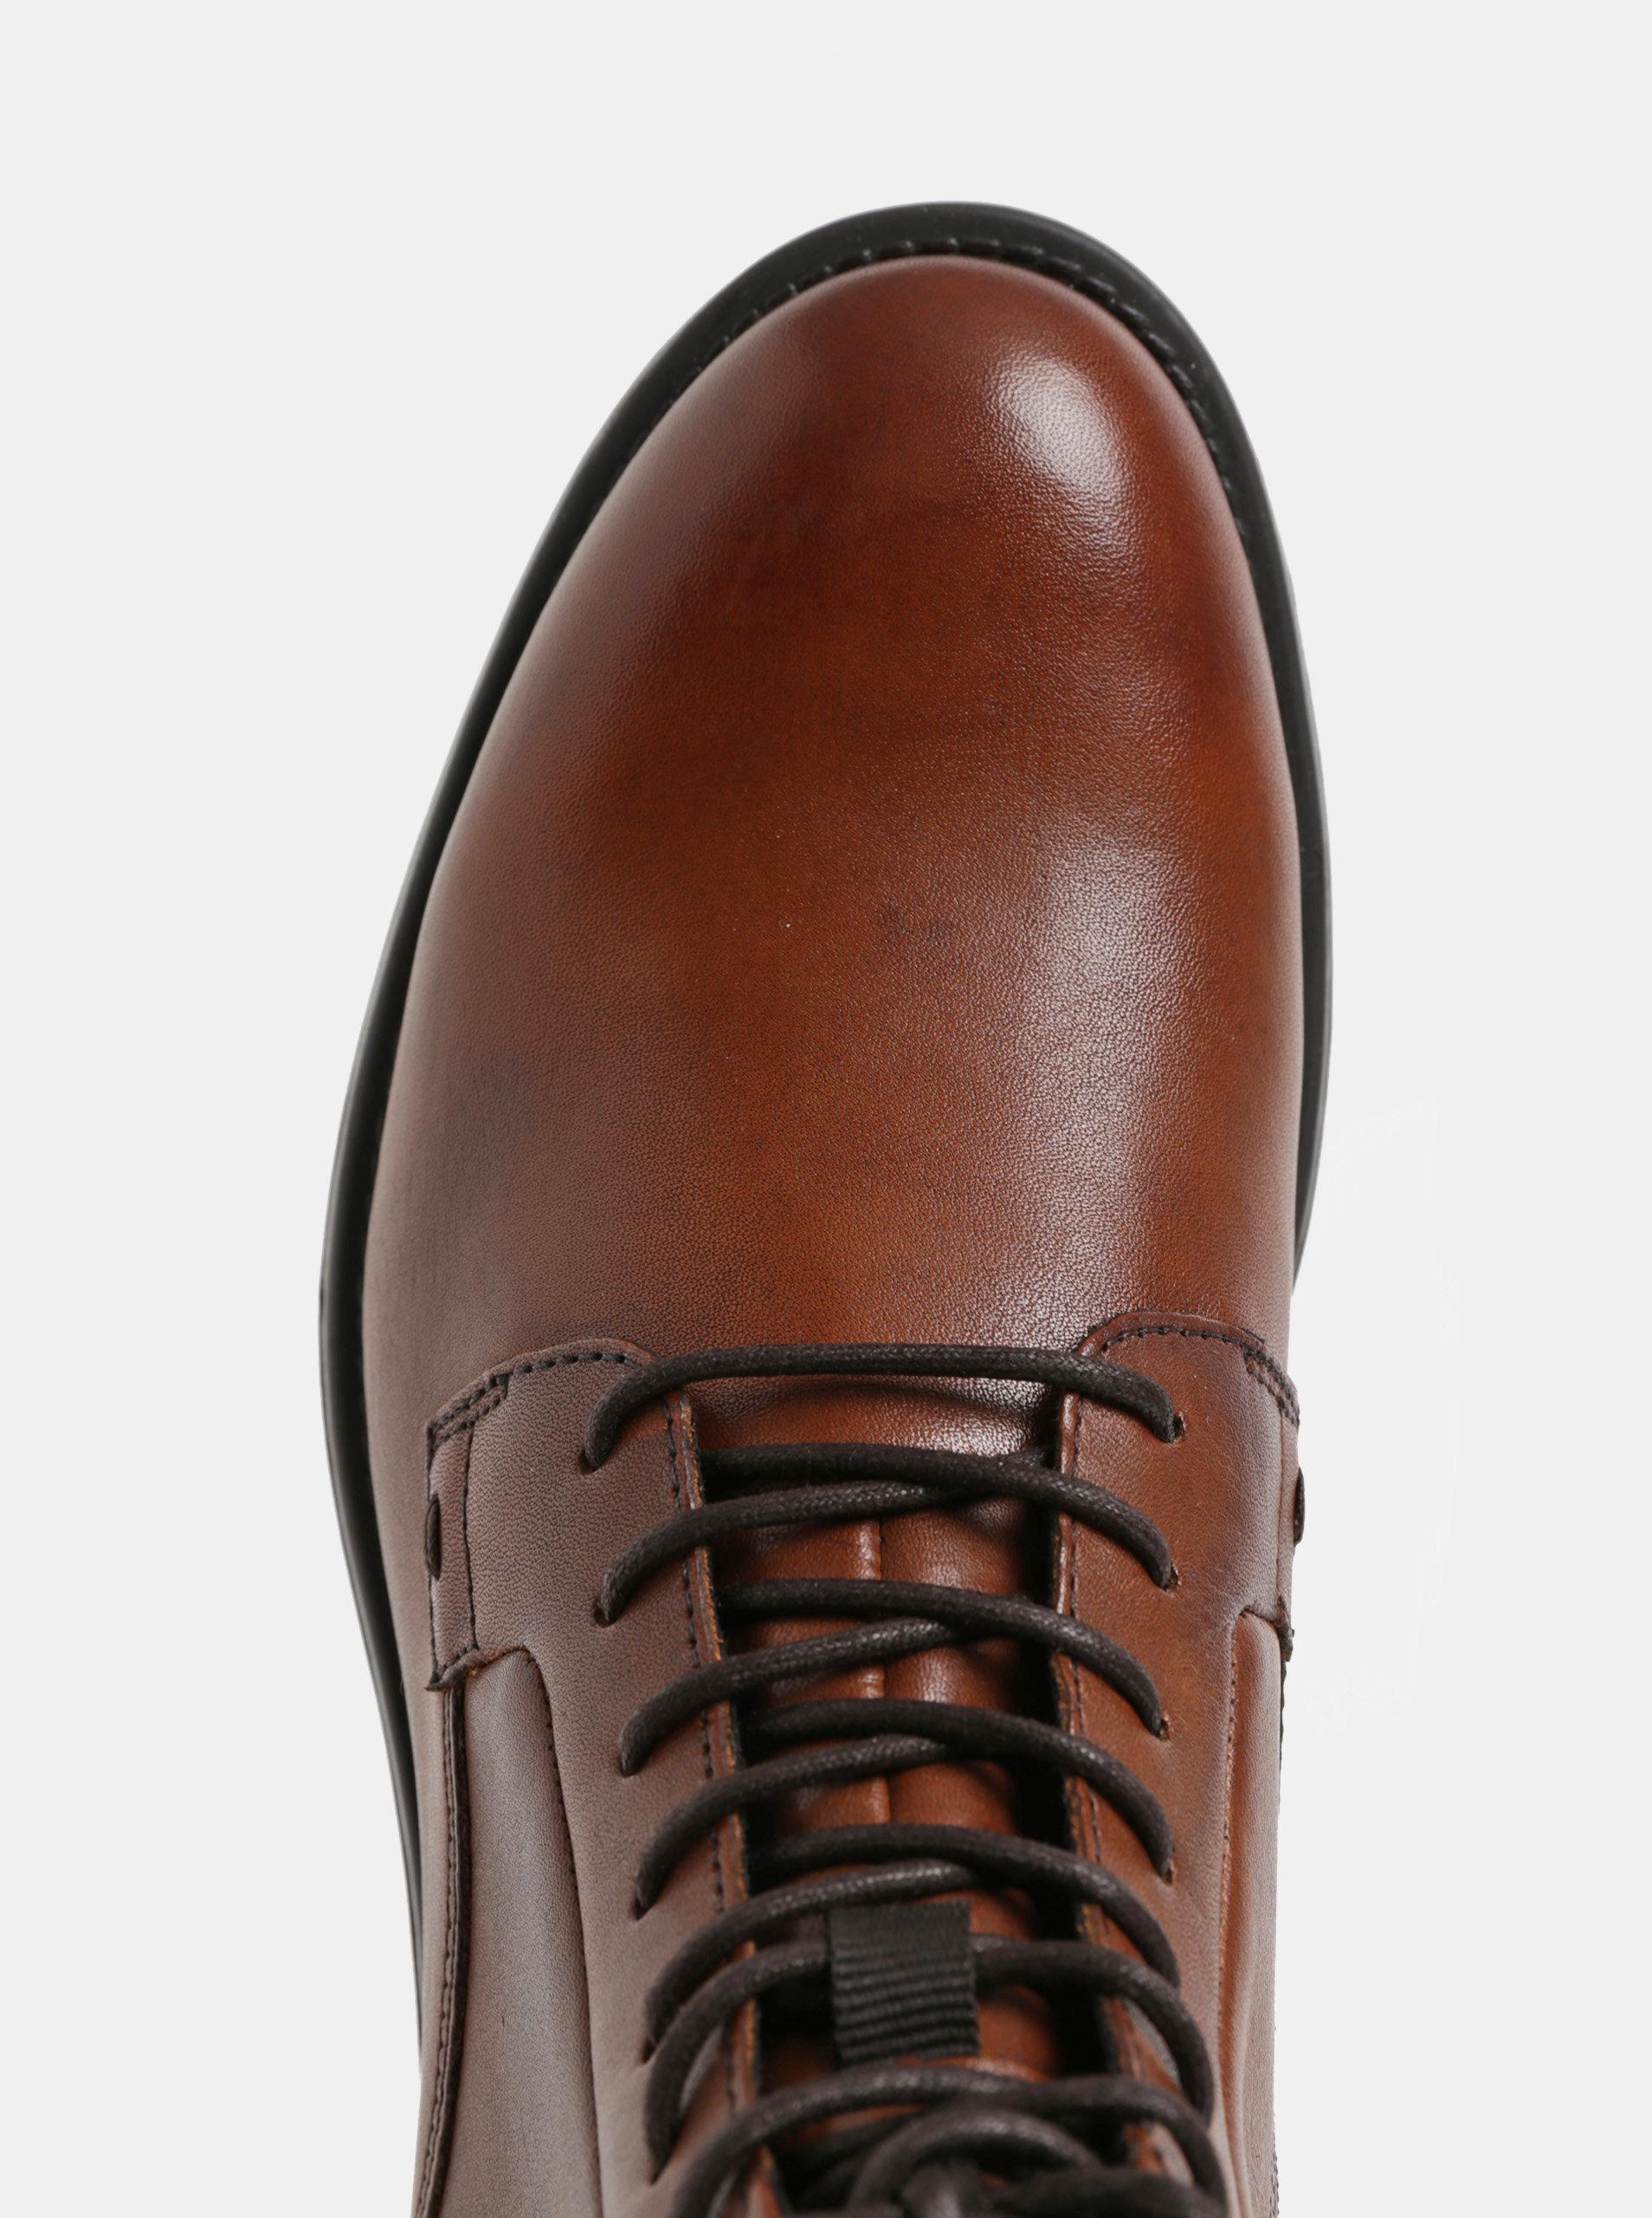 eefc56f051 Hnědé dámské kožené kotníkové boty Vagabond Amina ...